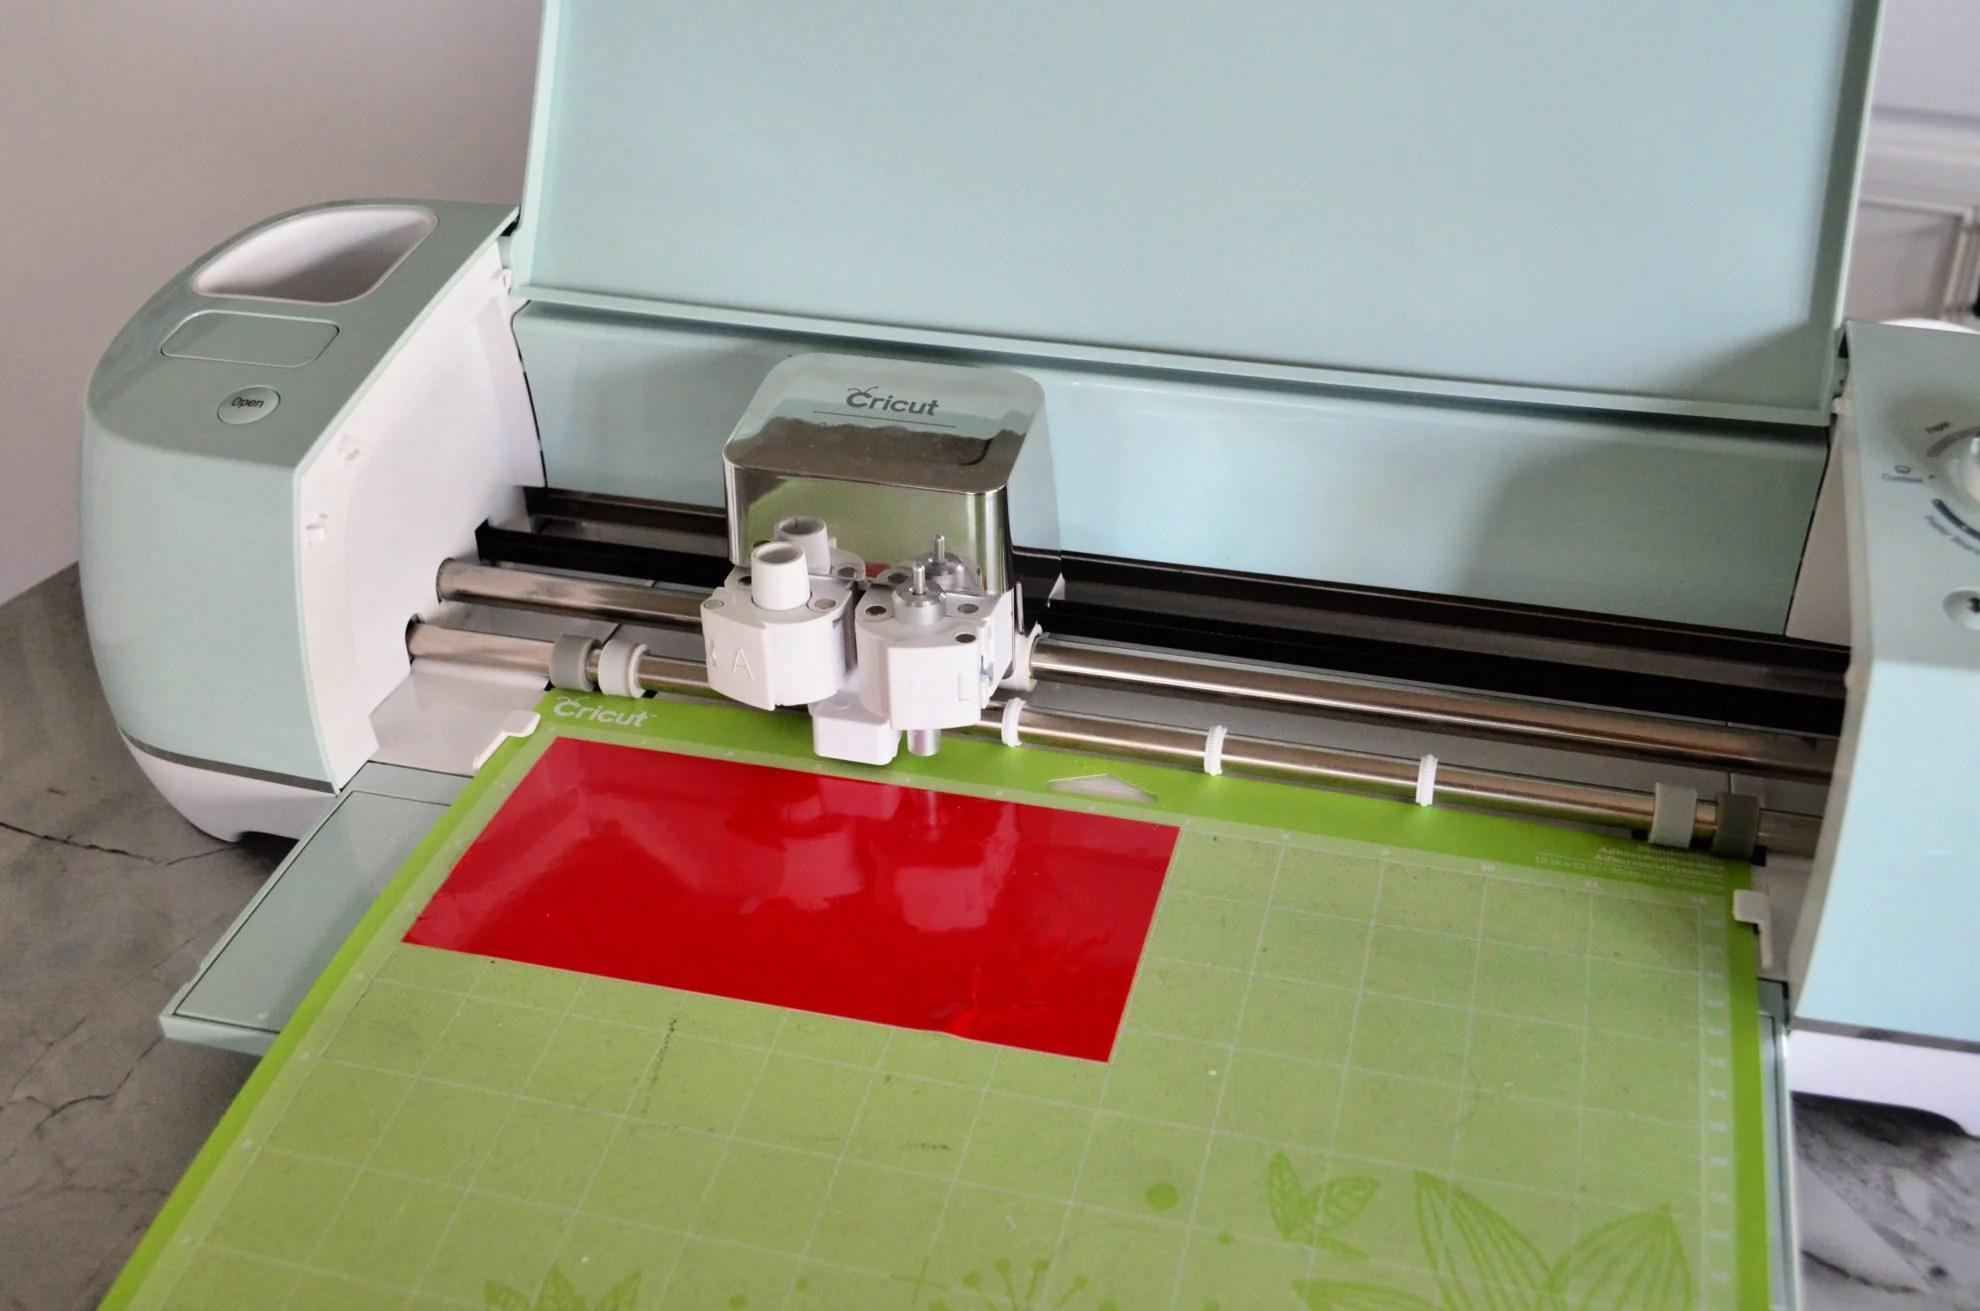 Cricut Explore Air 2 Red Vinyl